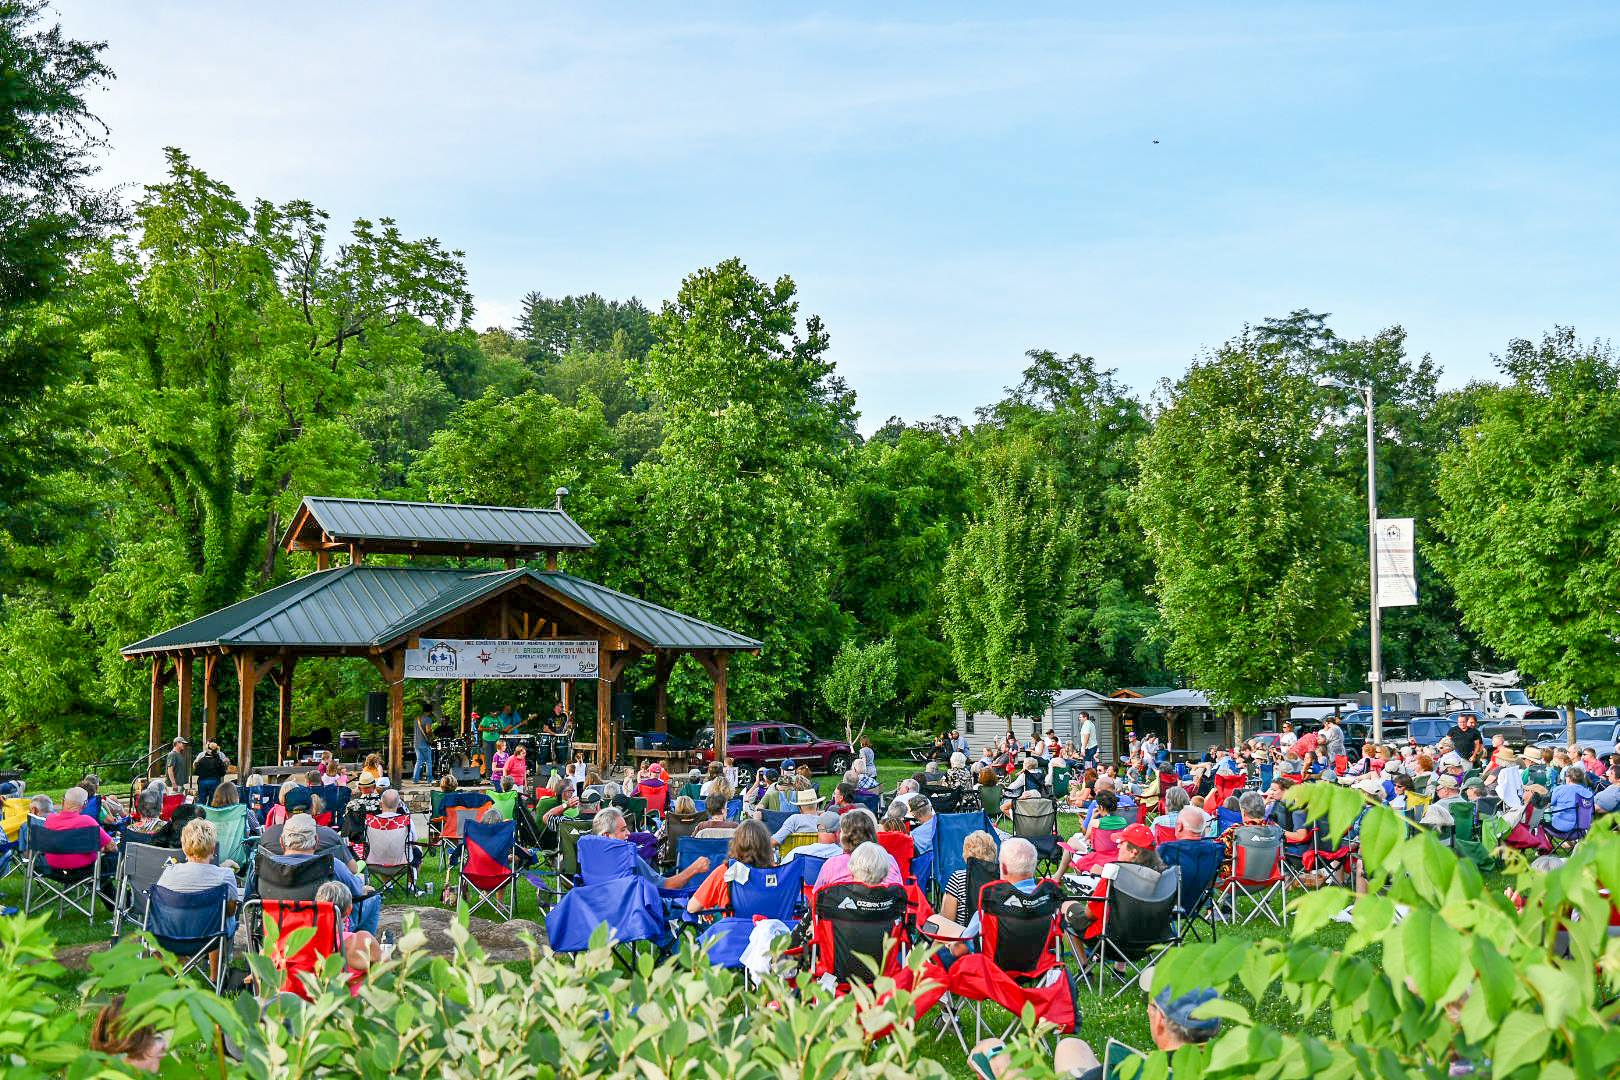 Concerts On The Creek Postponed Until June 26th